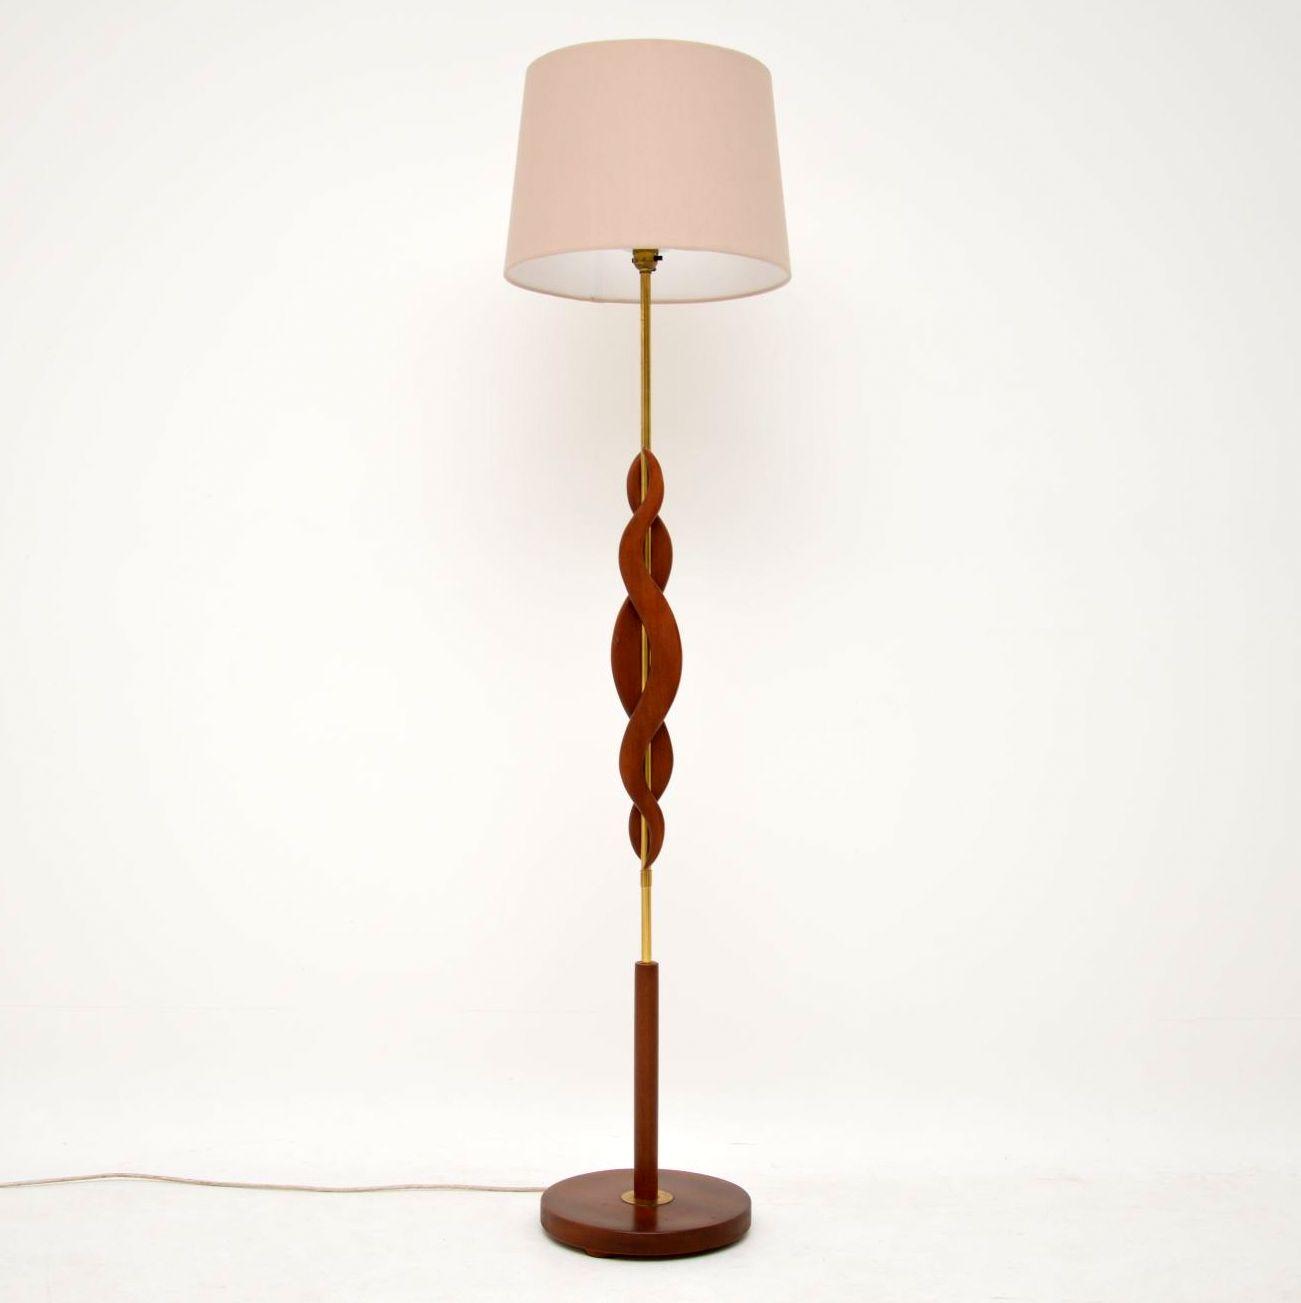 1960's Vintage Teak & Brass Floor Lamp